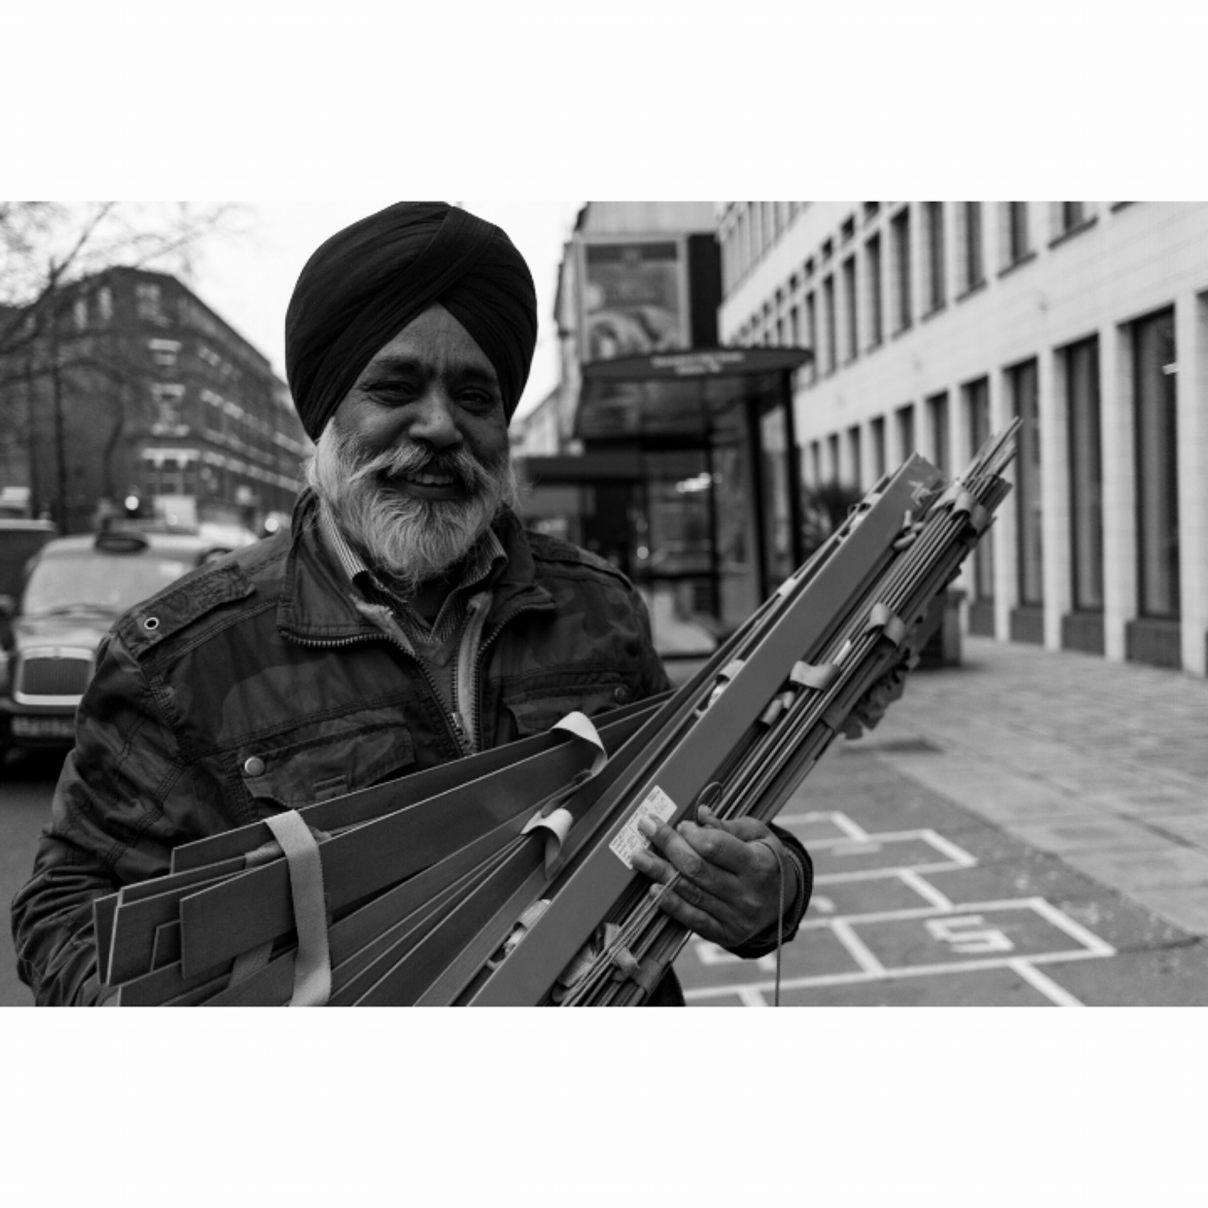 Man carrying wood, London - January 2017